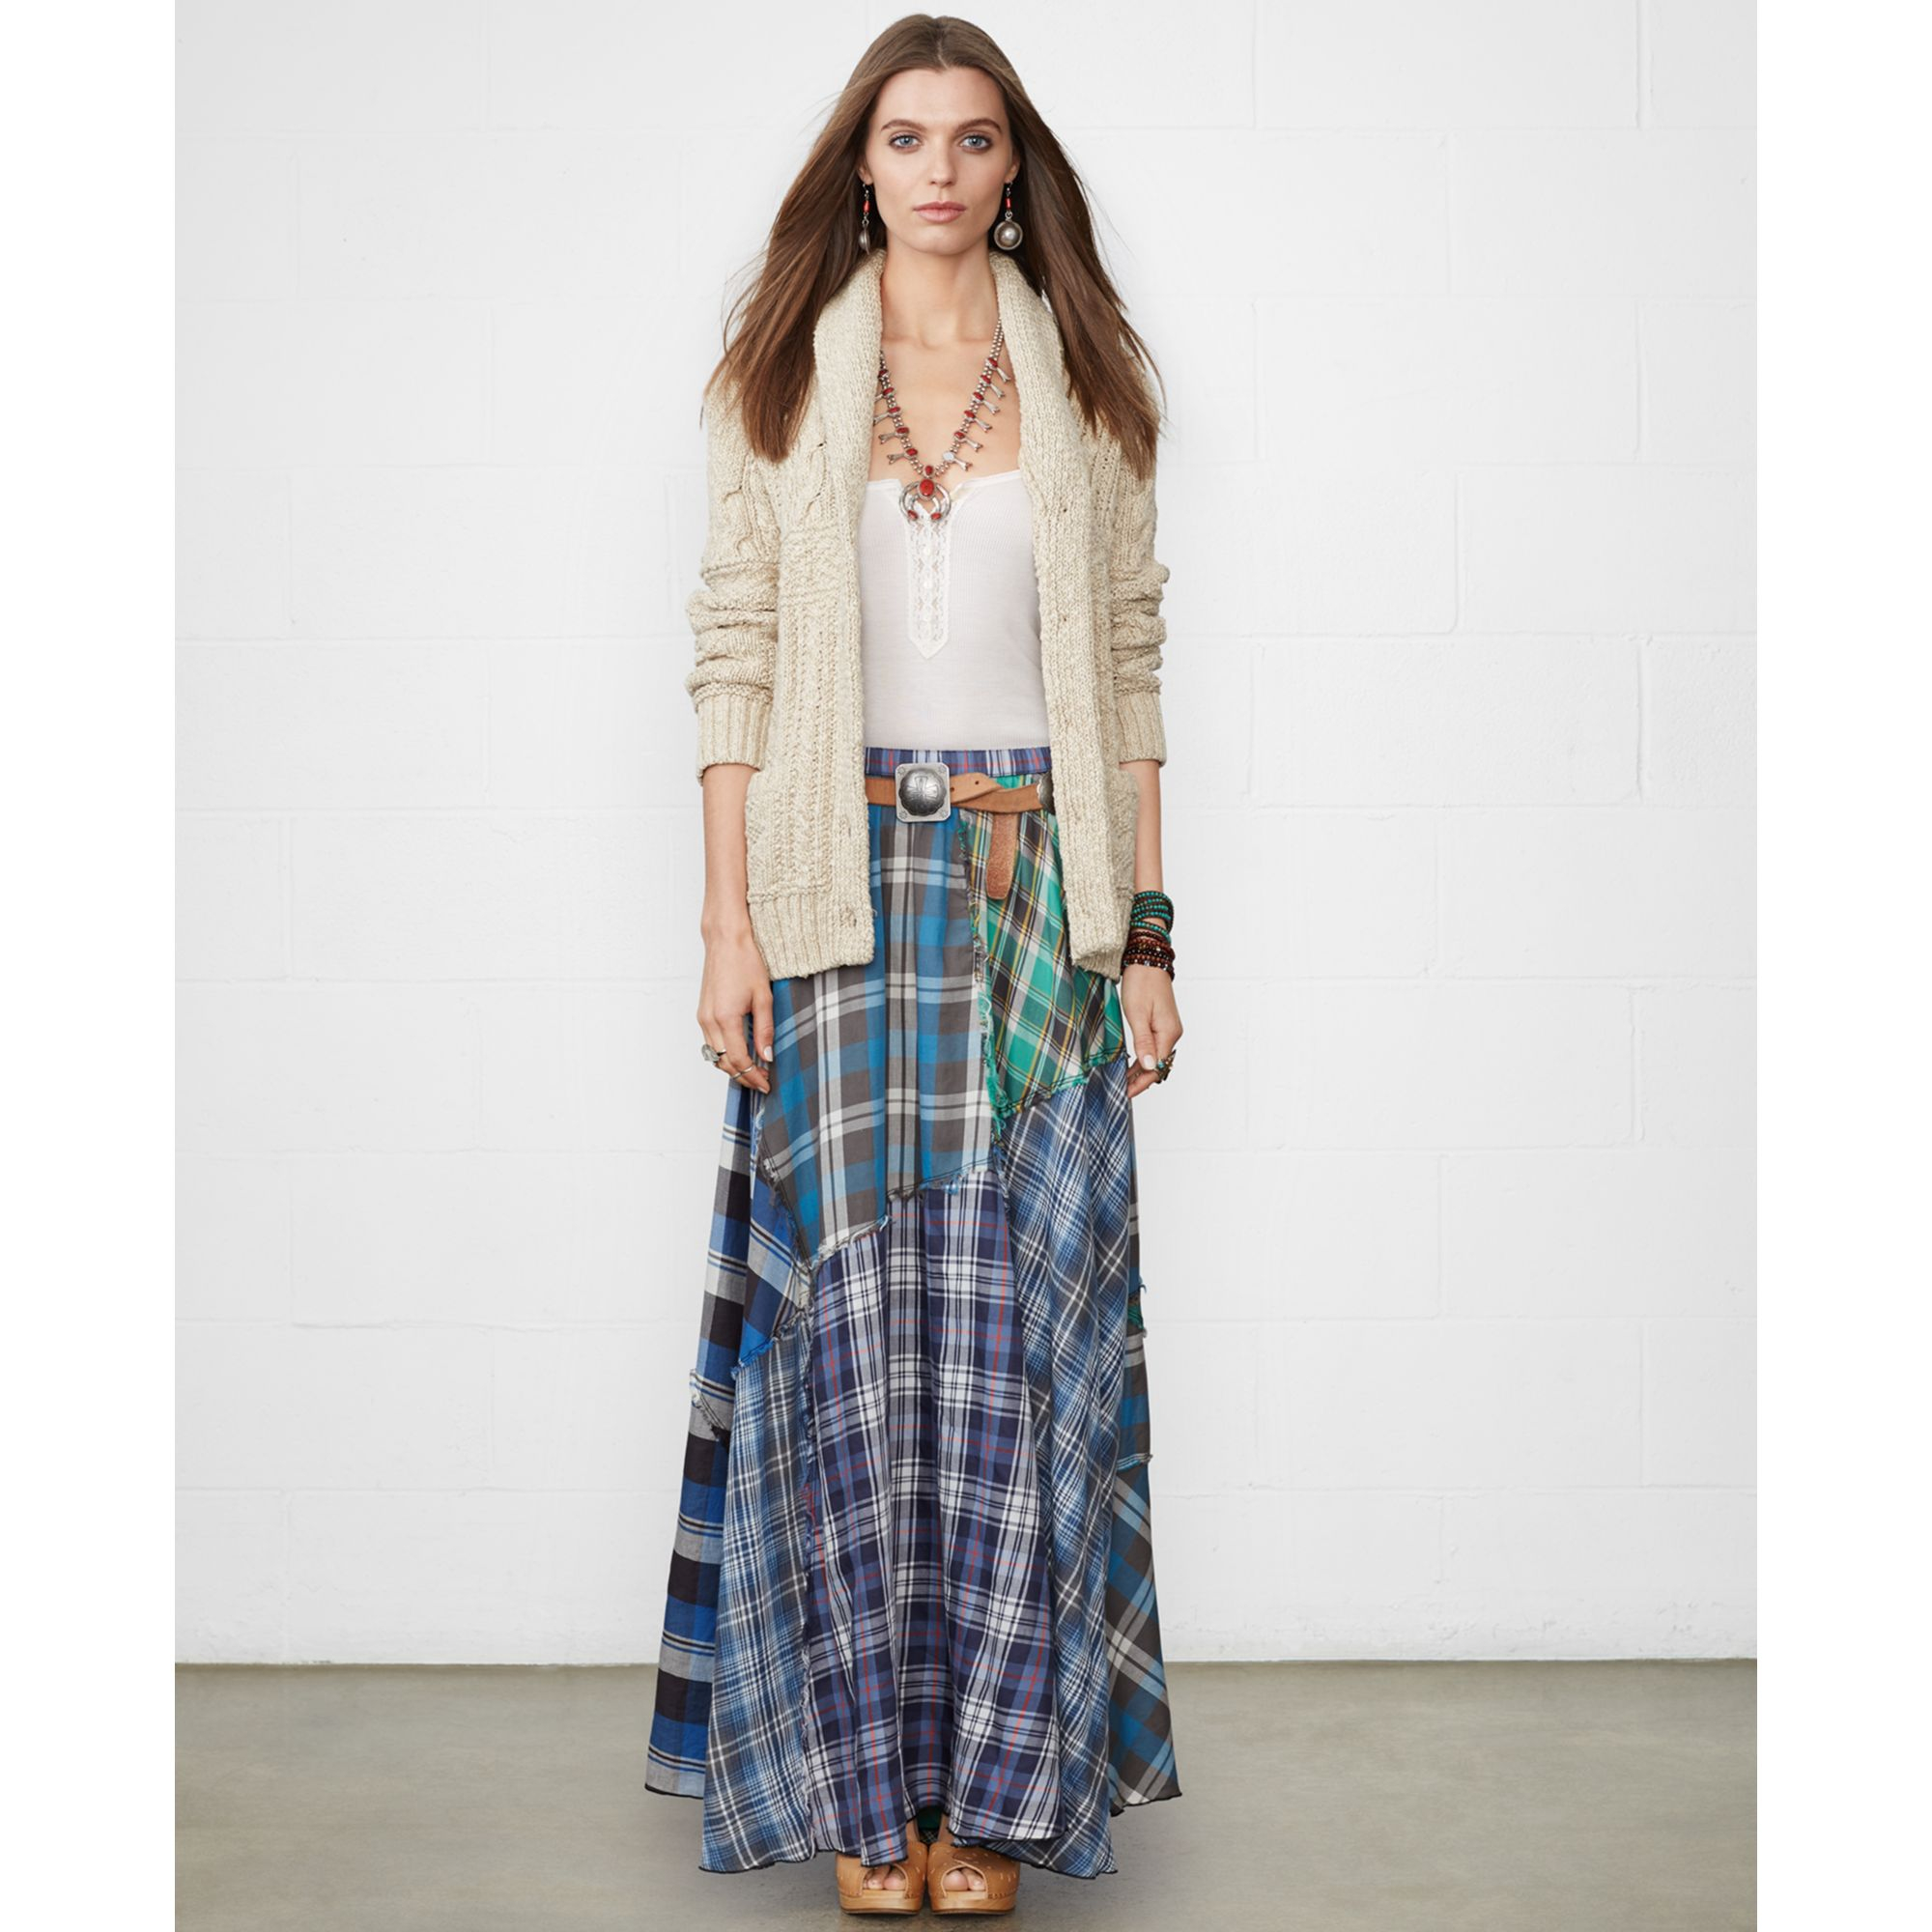 Denim & supply ralph lauren Patchwork Plaid Maxi Skirt | Lyst